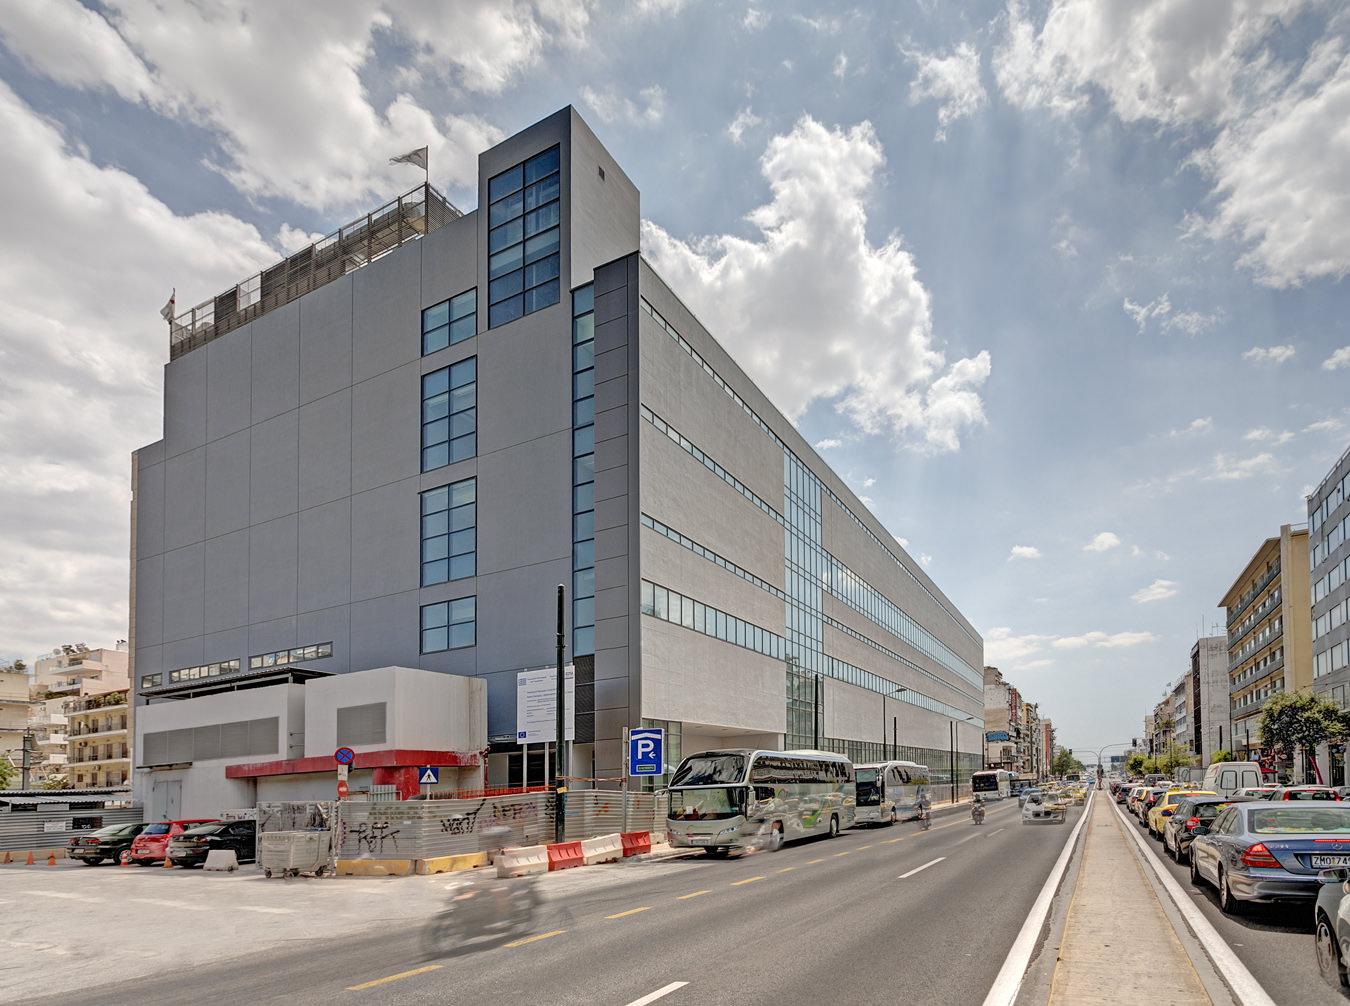 GREEK NATIONAL MUSEUM OF CONTEMPORARY ART, Γιώργος Φάκαρος - Αρχιτεκτονική Φωτογραφία | Εσωτερικοί Χώροι | Φωτογραφία Ξενοδοχειών - Photography / Φωτογραφία